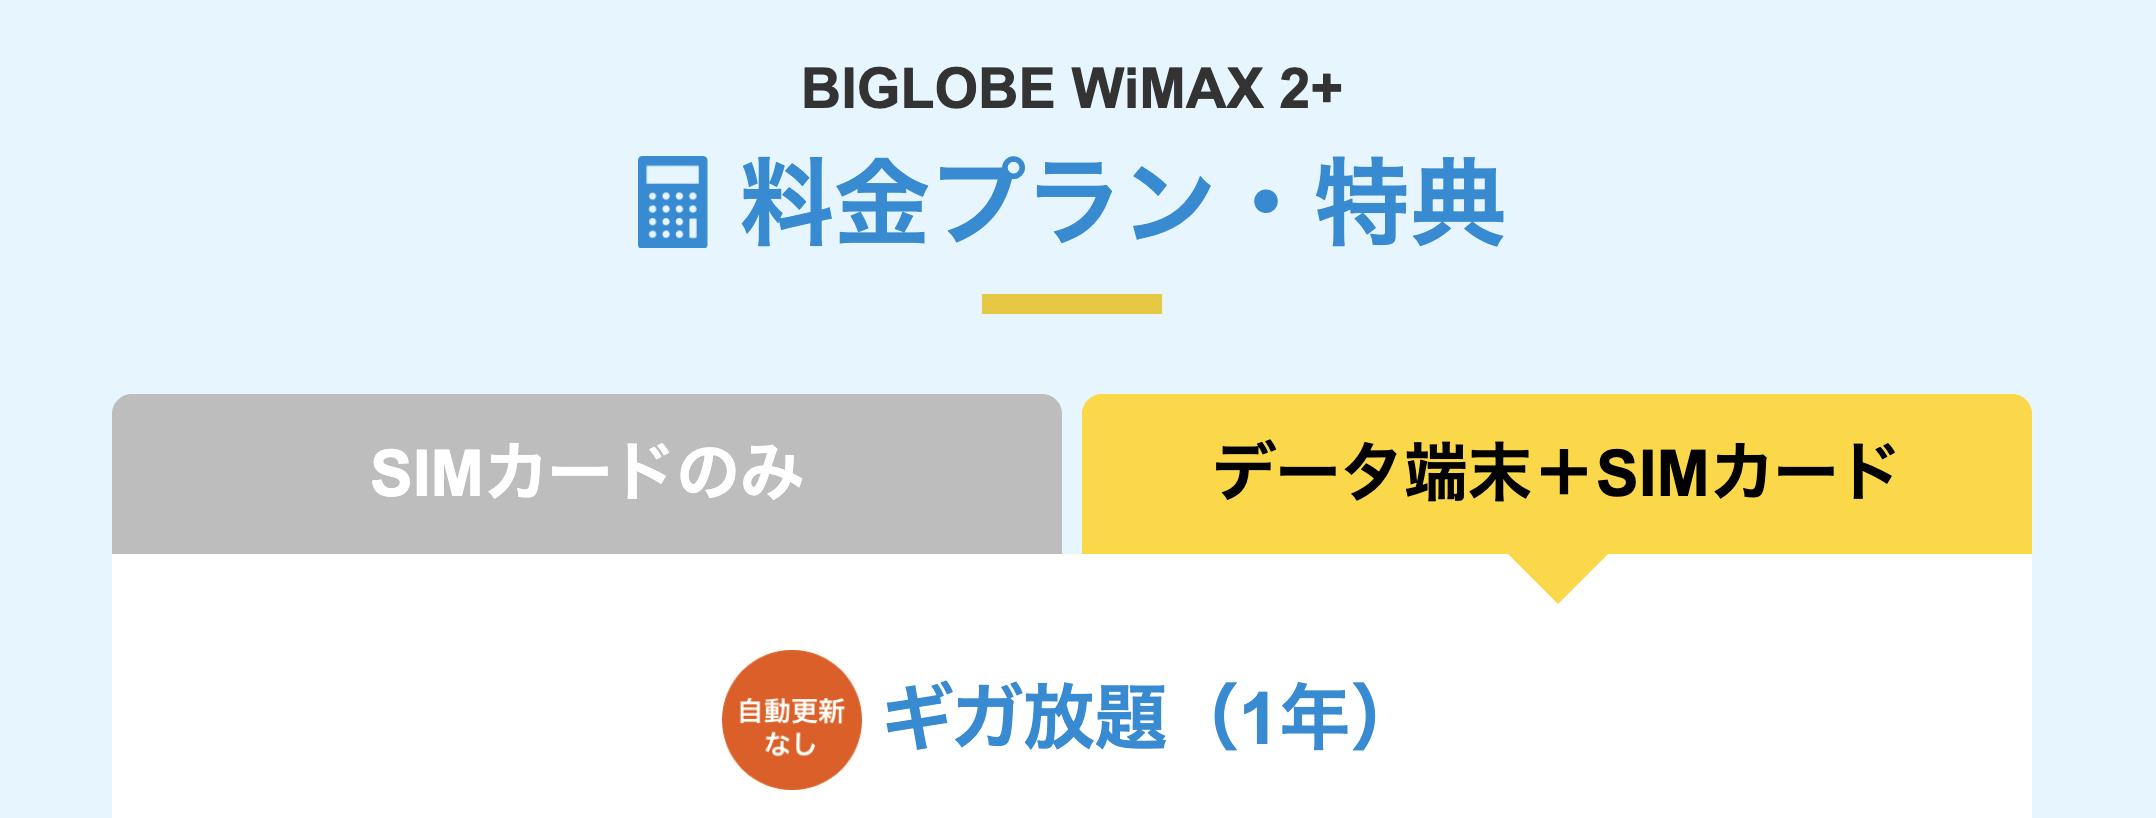 BIGLOBE WiMAXの料金プラン